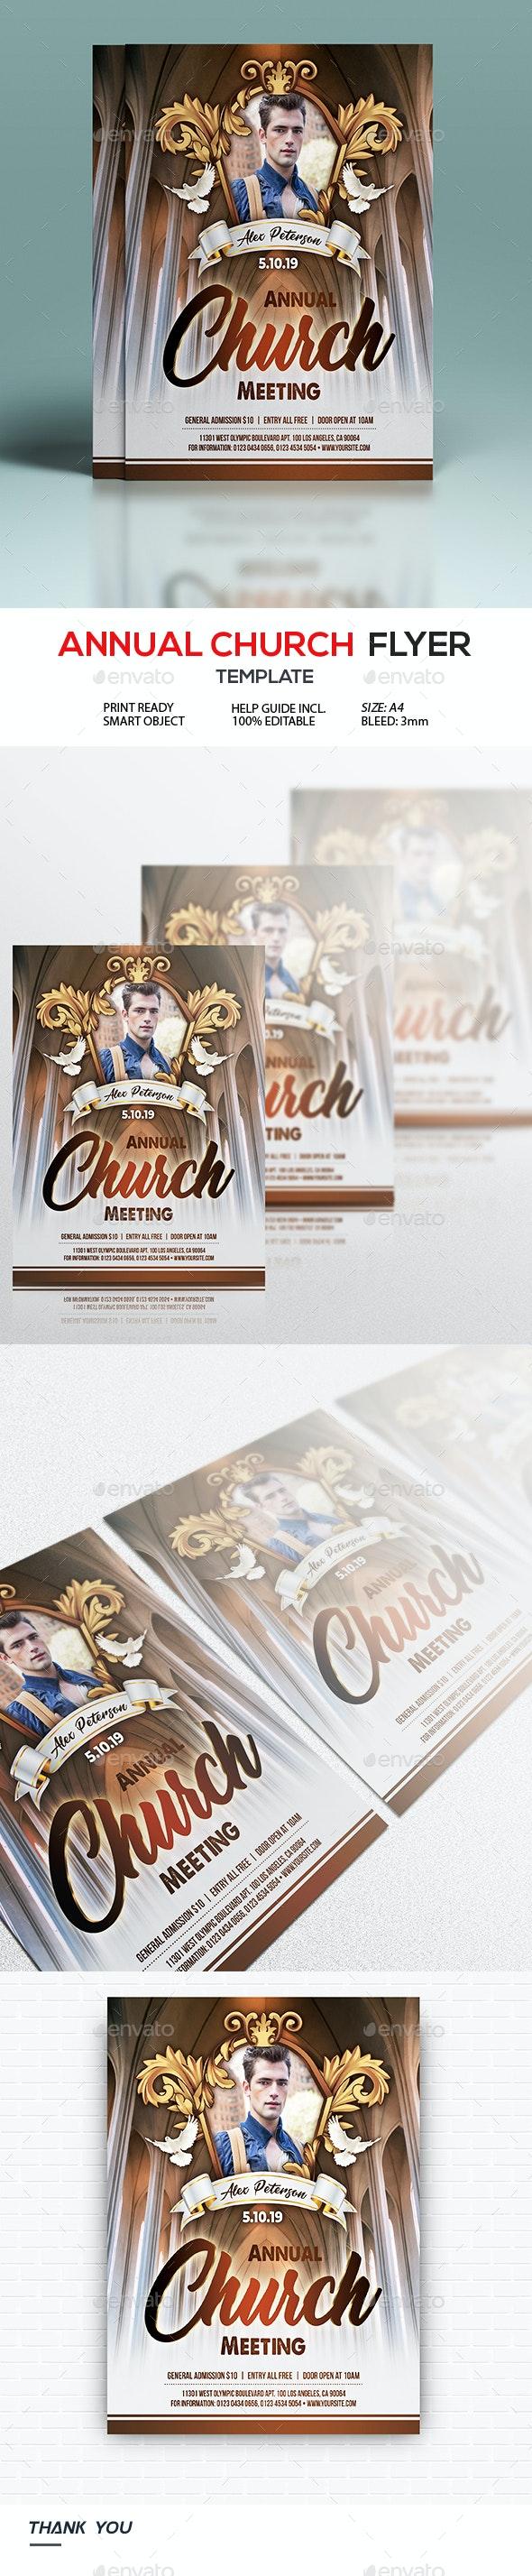 Annual Church Flyer - Events Flyers